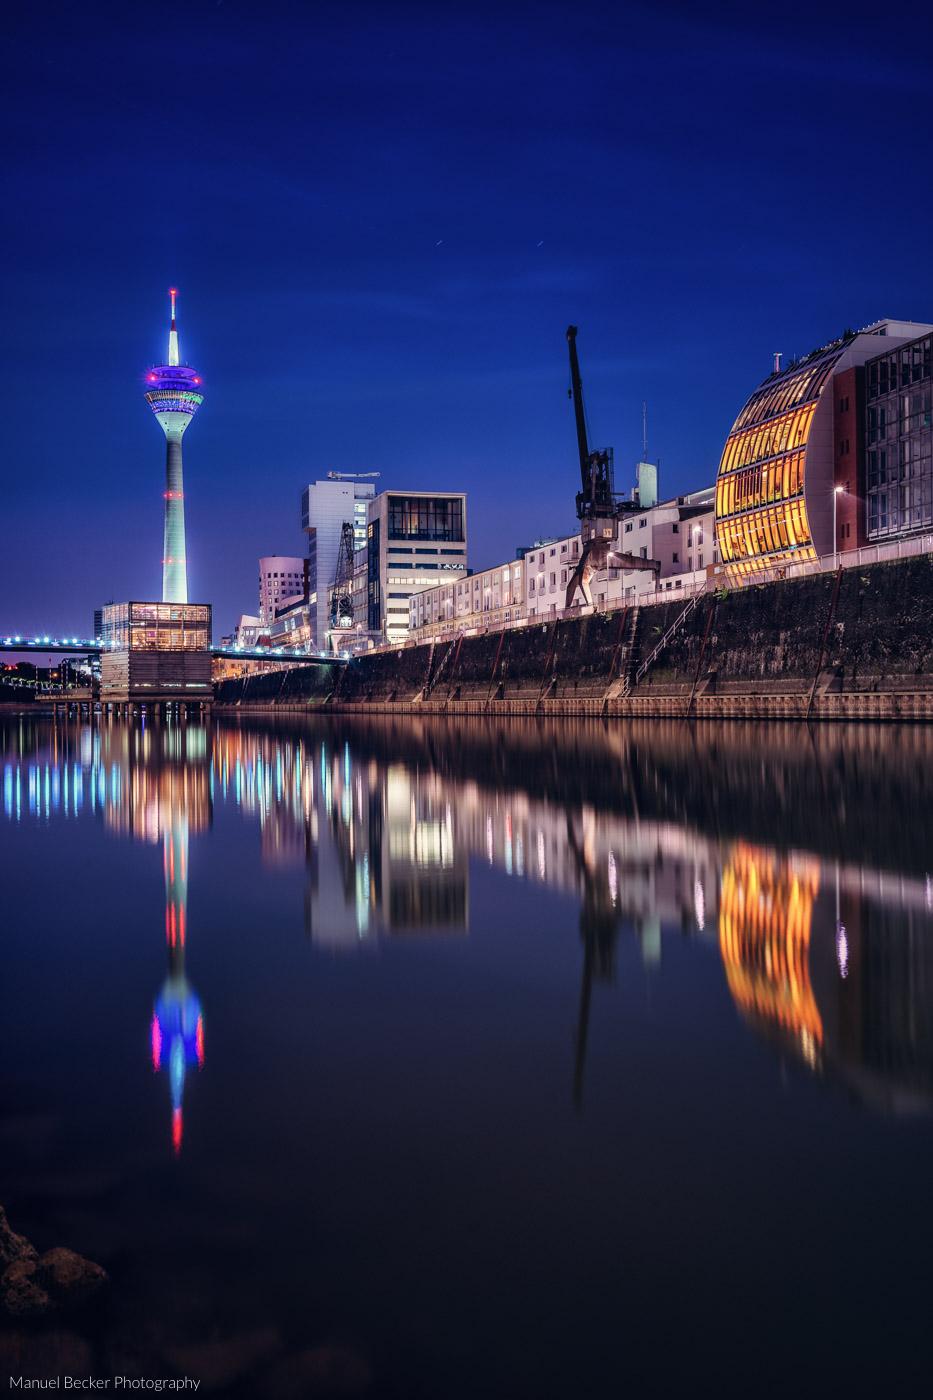 View to Rheinturm from Media Harbor, Düsseldorf, Germany